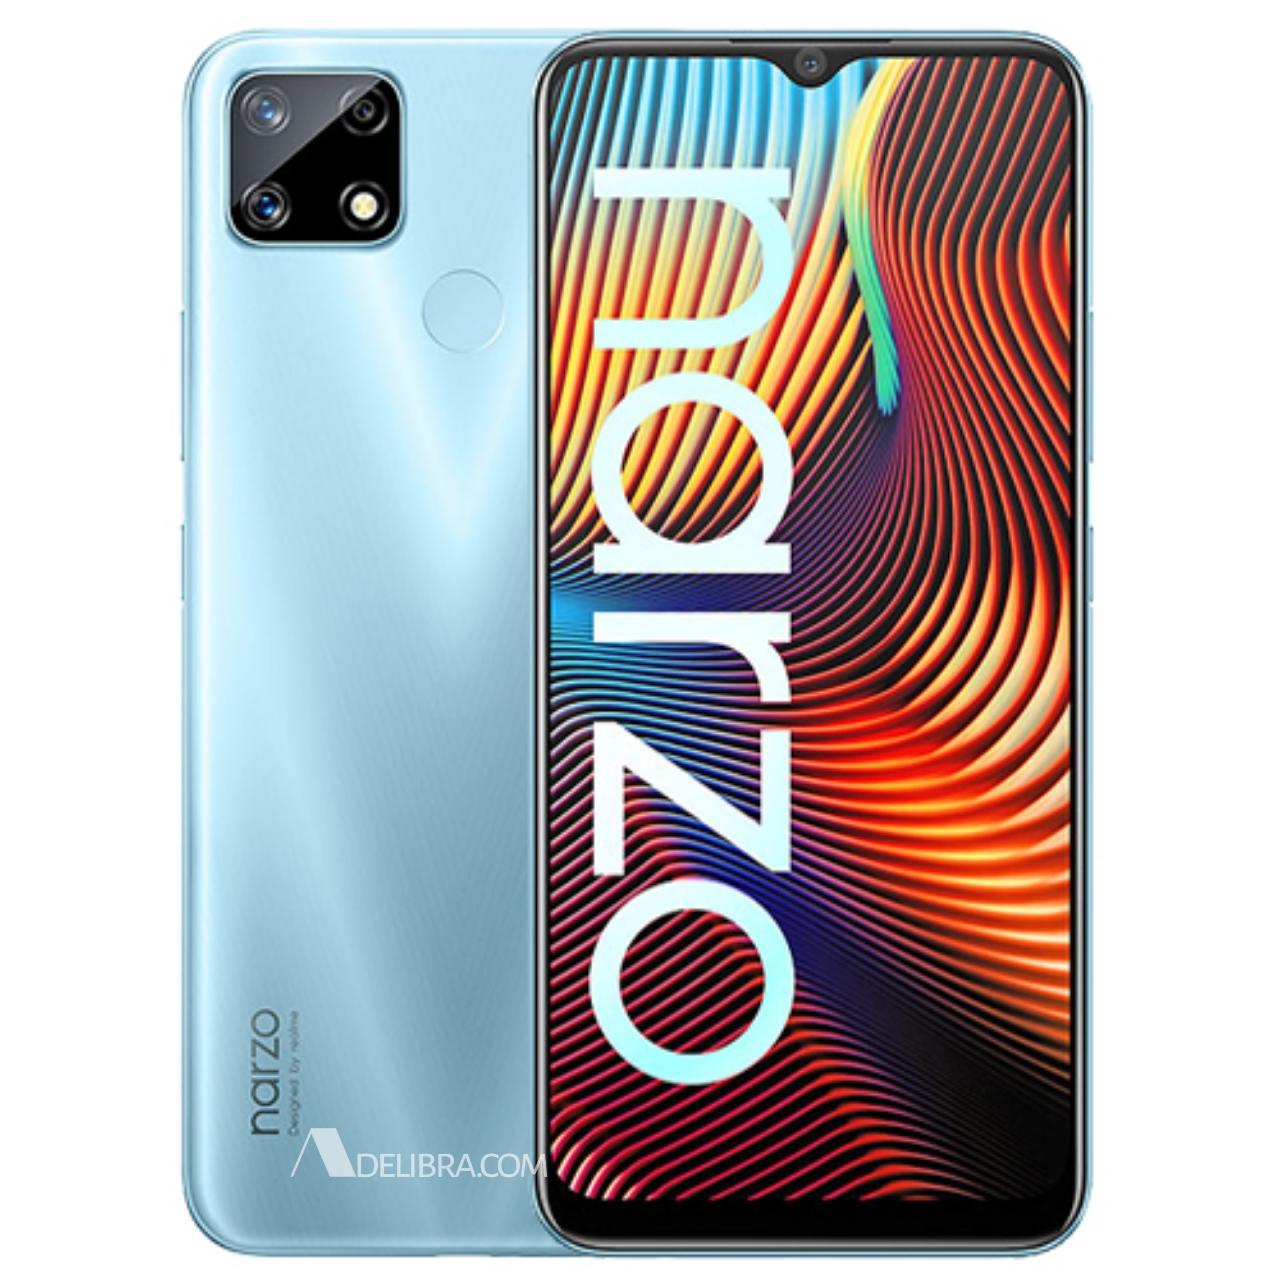 Realme Narzo 20 FAQs